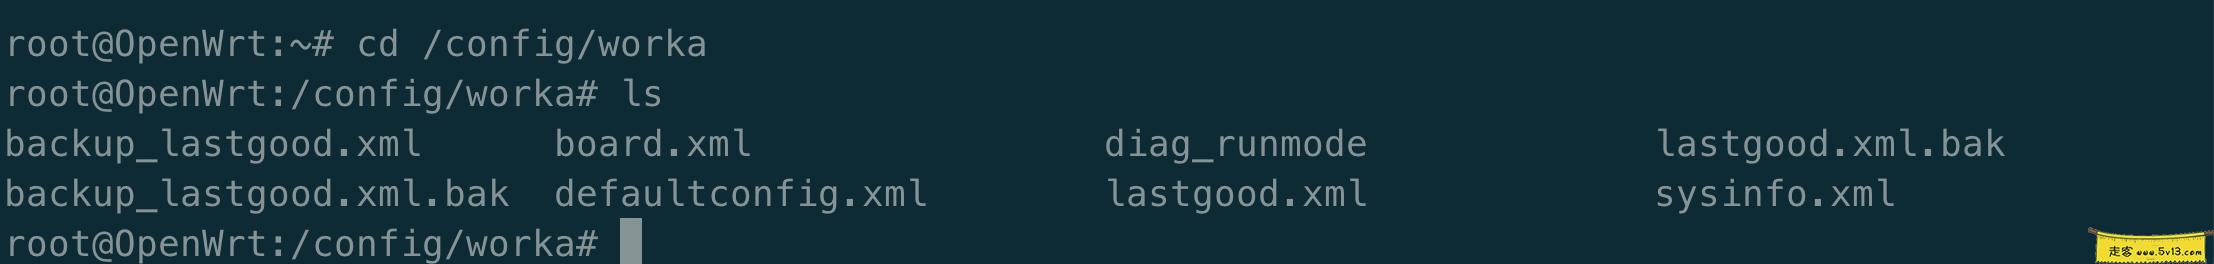 telnet-dir-file